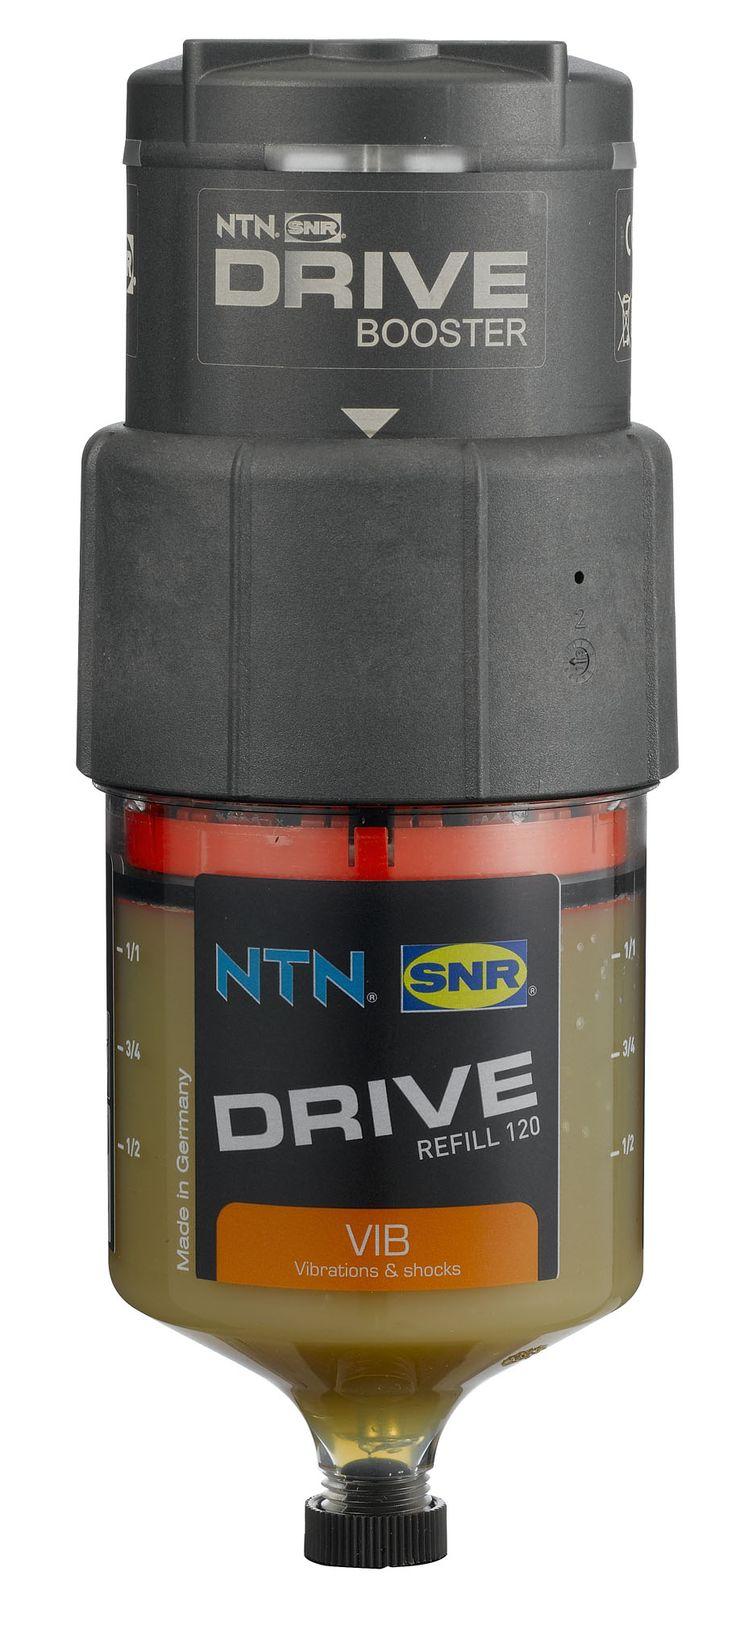 LUBER DRIVE KIT 120-VIB (for high vibrations)